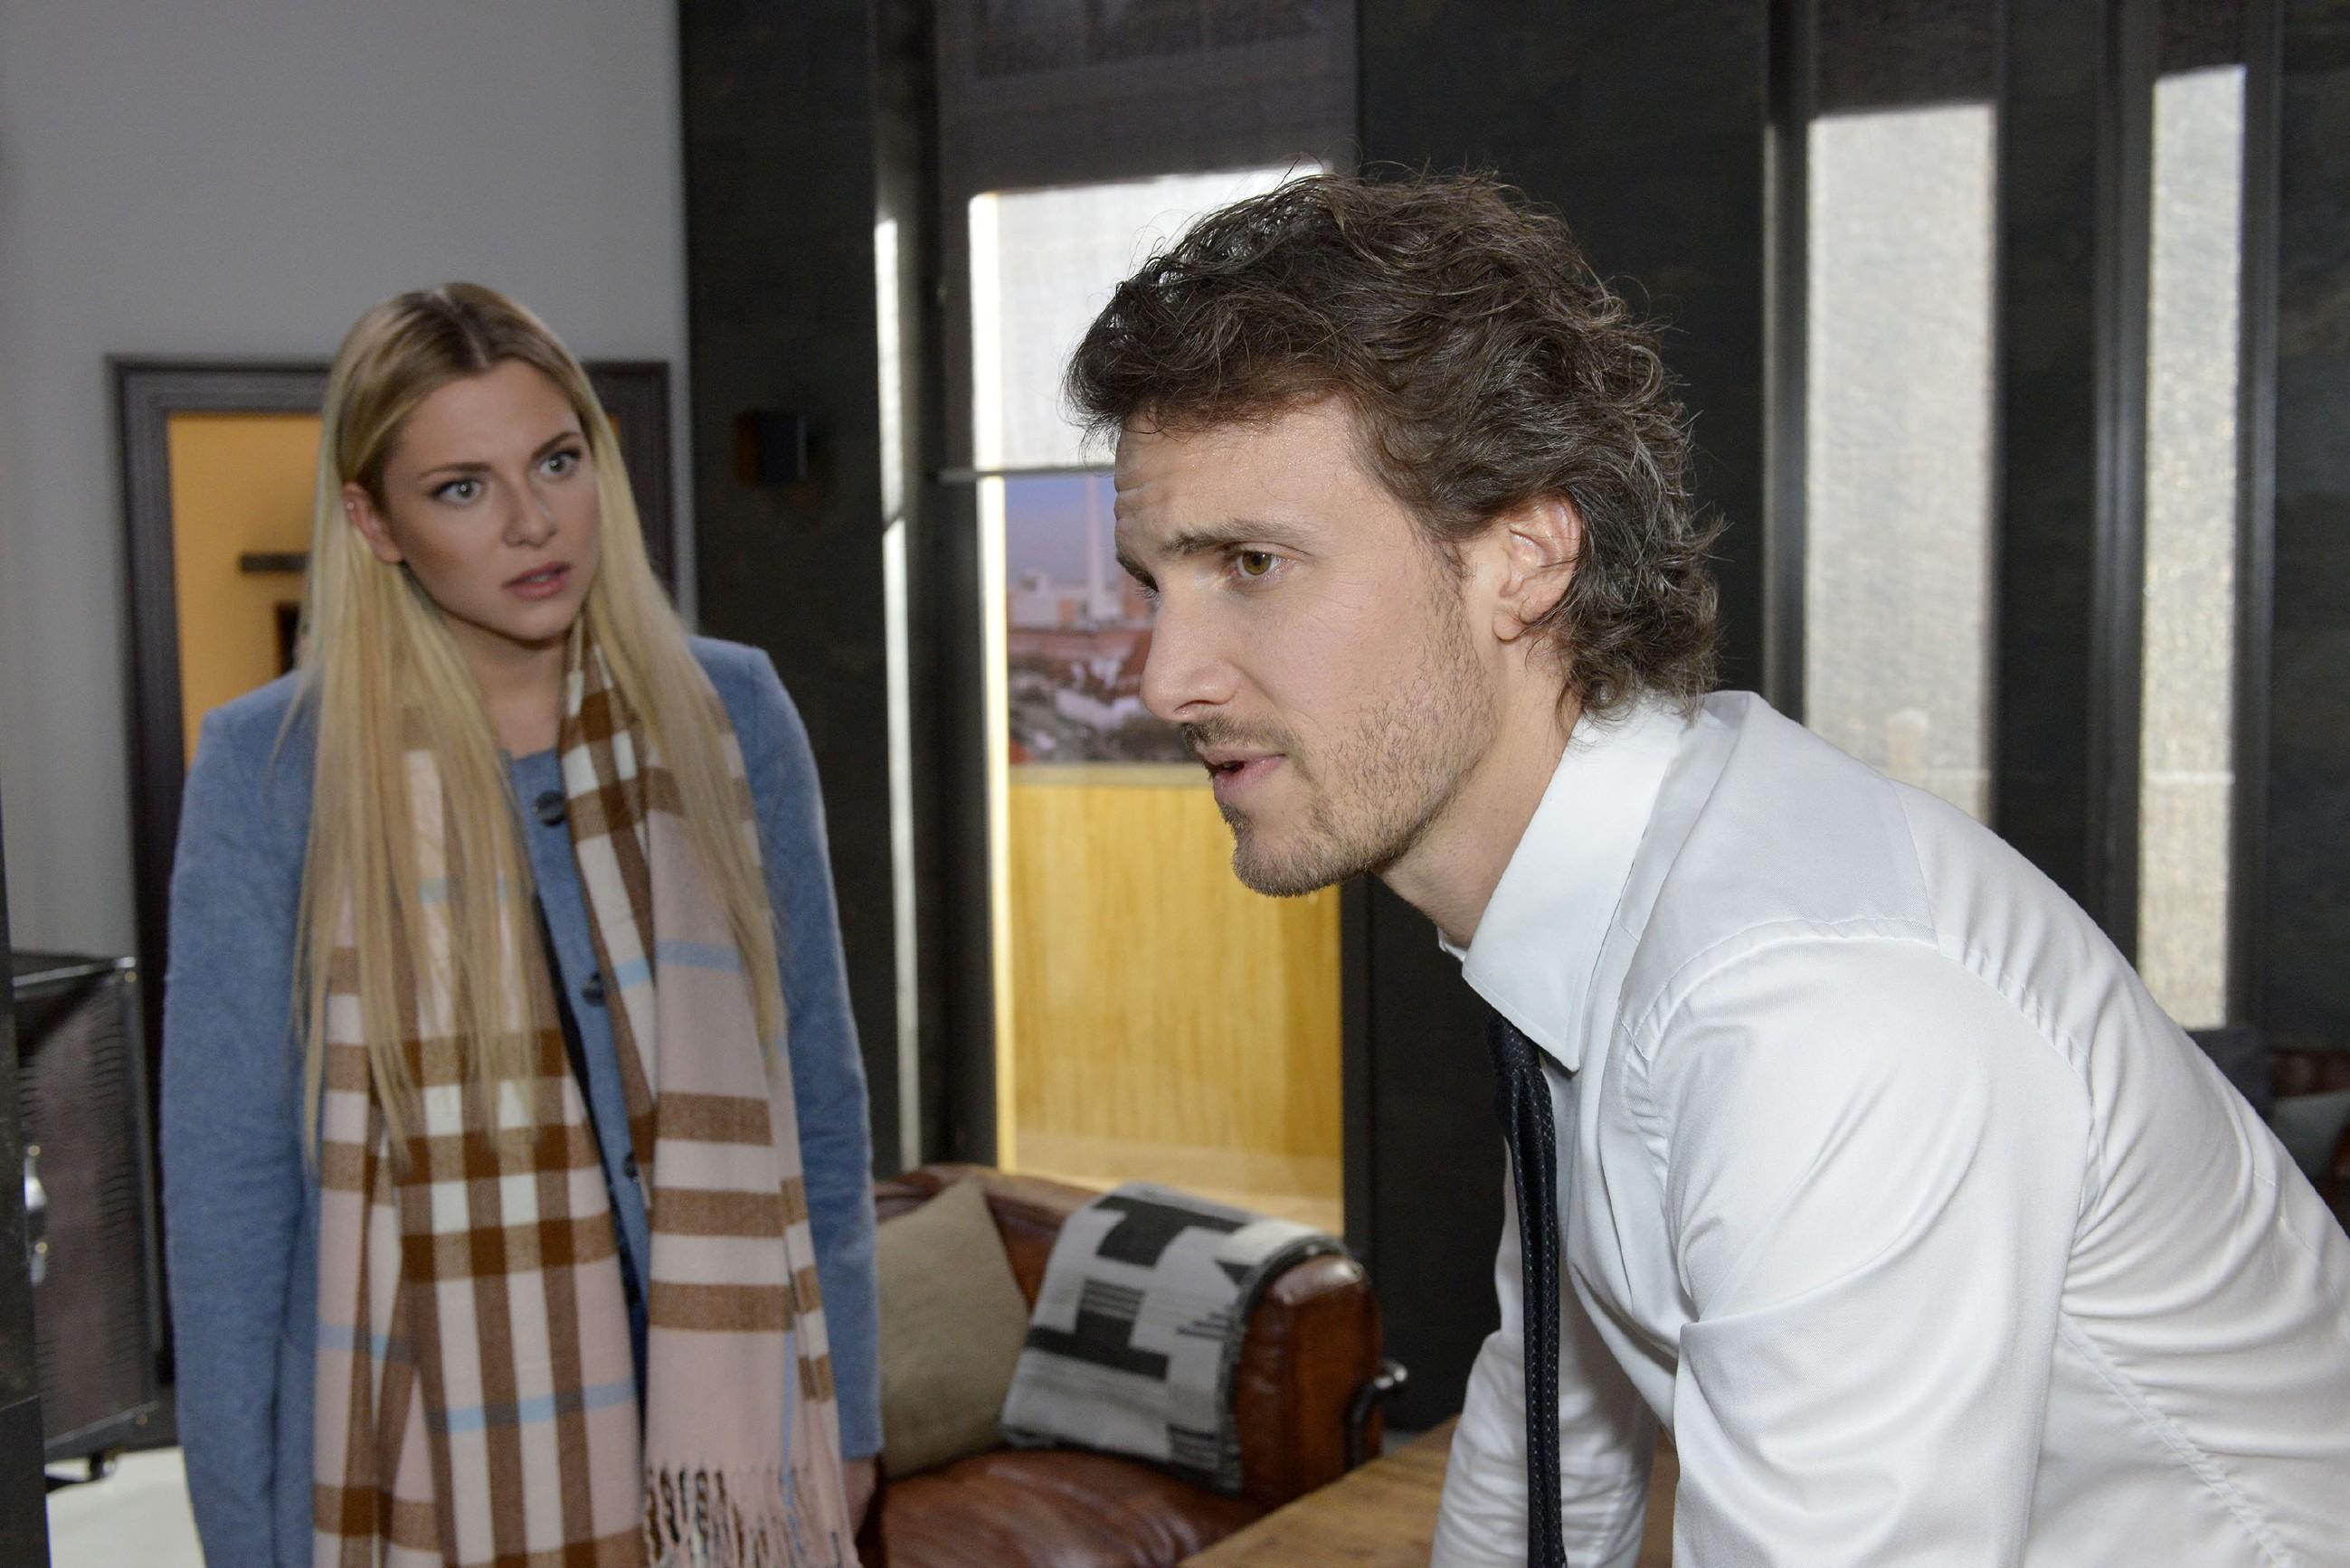 Sunny (Valentina Pahde) schmerzt es, Felix (Thaddäus Meilinger) so deprimiert zu sehen. (RTL / Rolf Baumgartner)